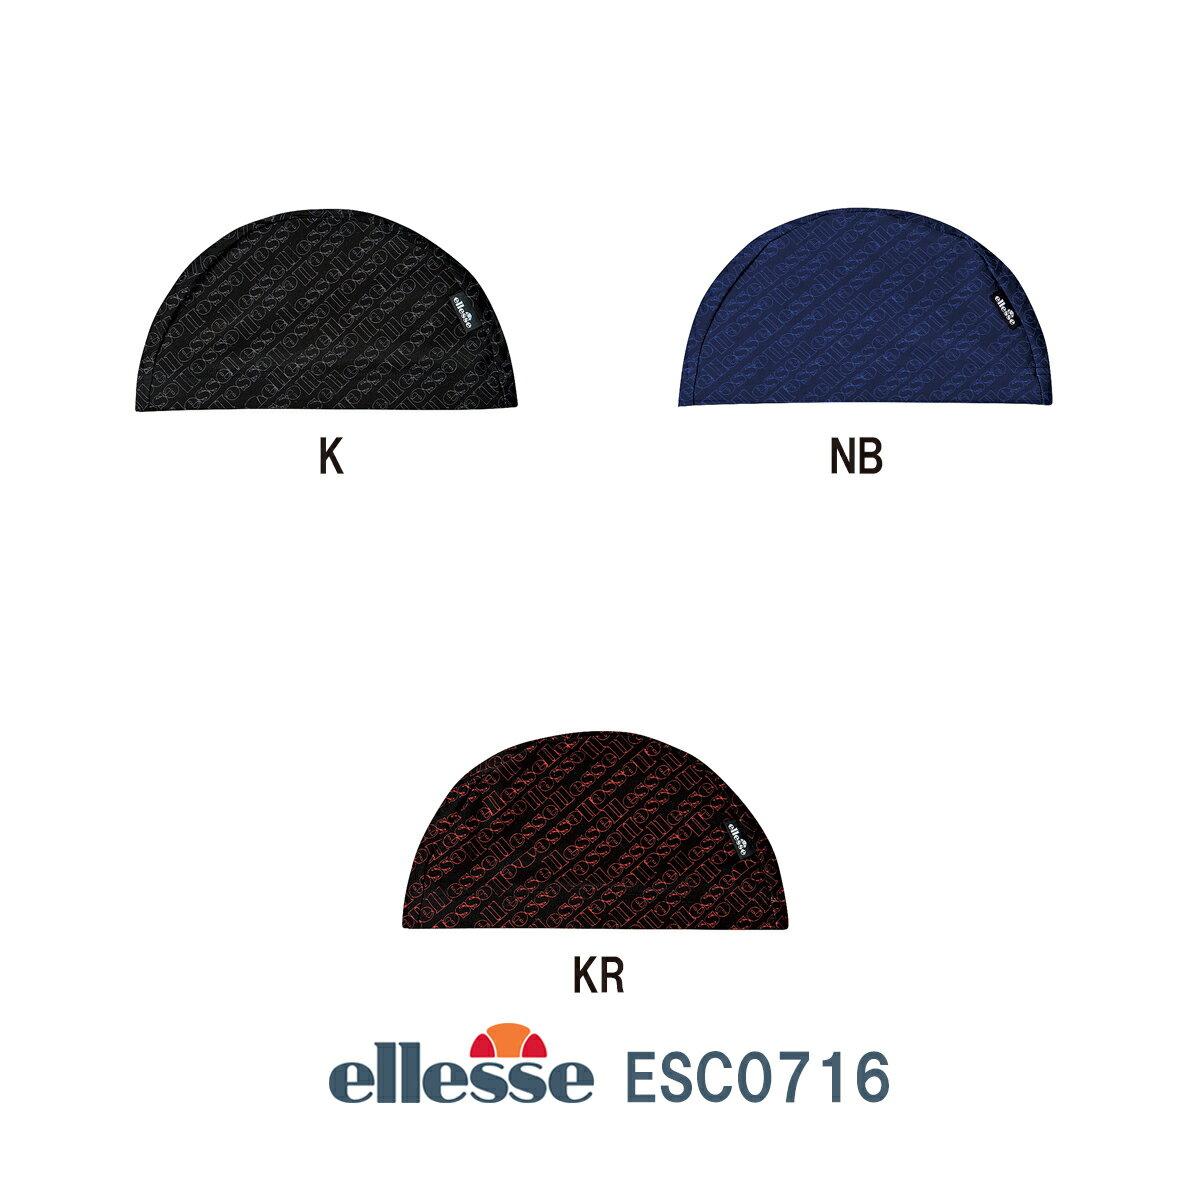 【ESC0716】ellesse(エレッセ)スイムキャップ<エレッセロゴ>[水泳帽/スイムキャップ/スイミング/ニットキャップ]